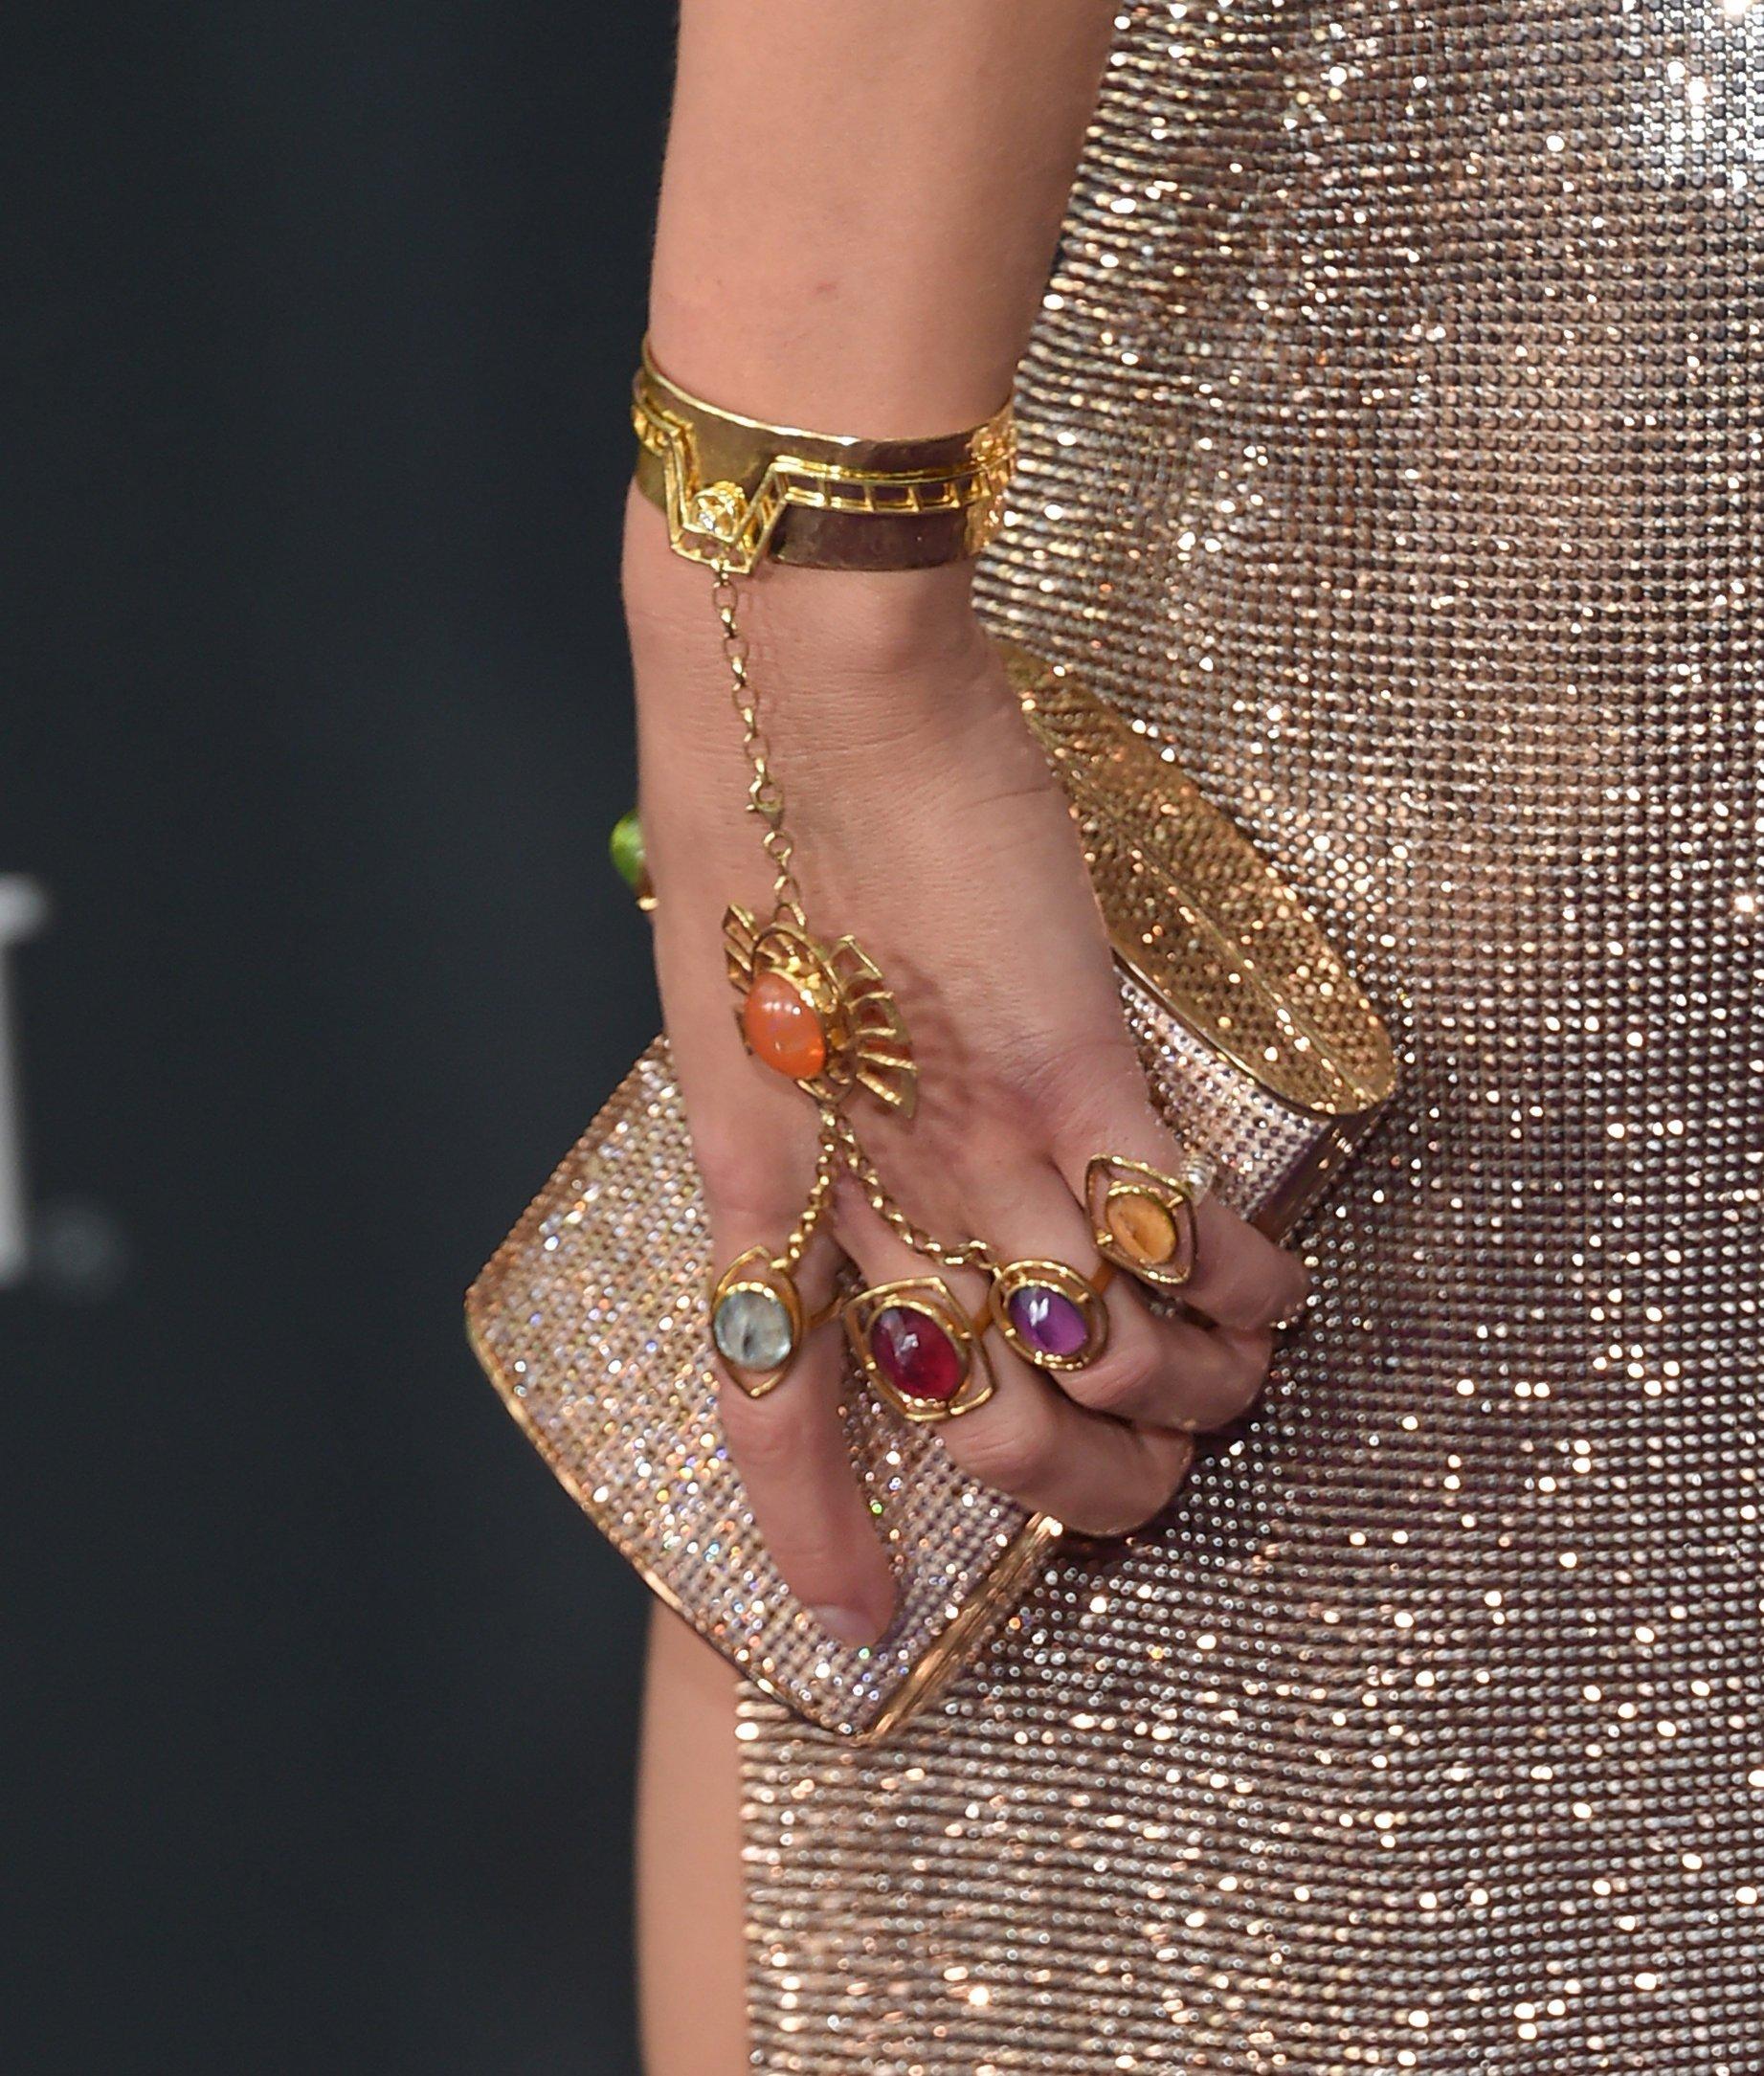 Natalie Portman at the world premiere of